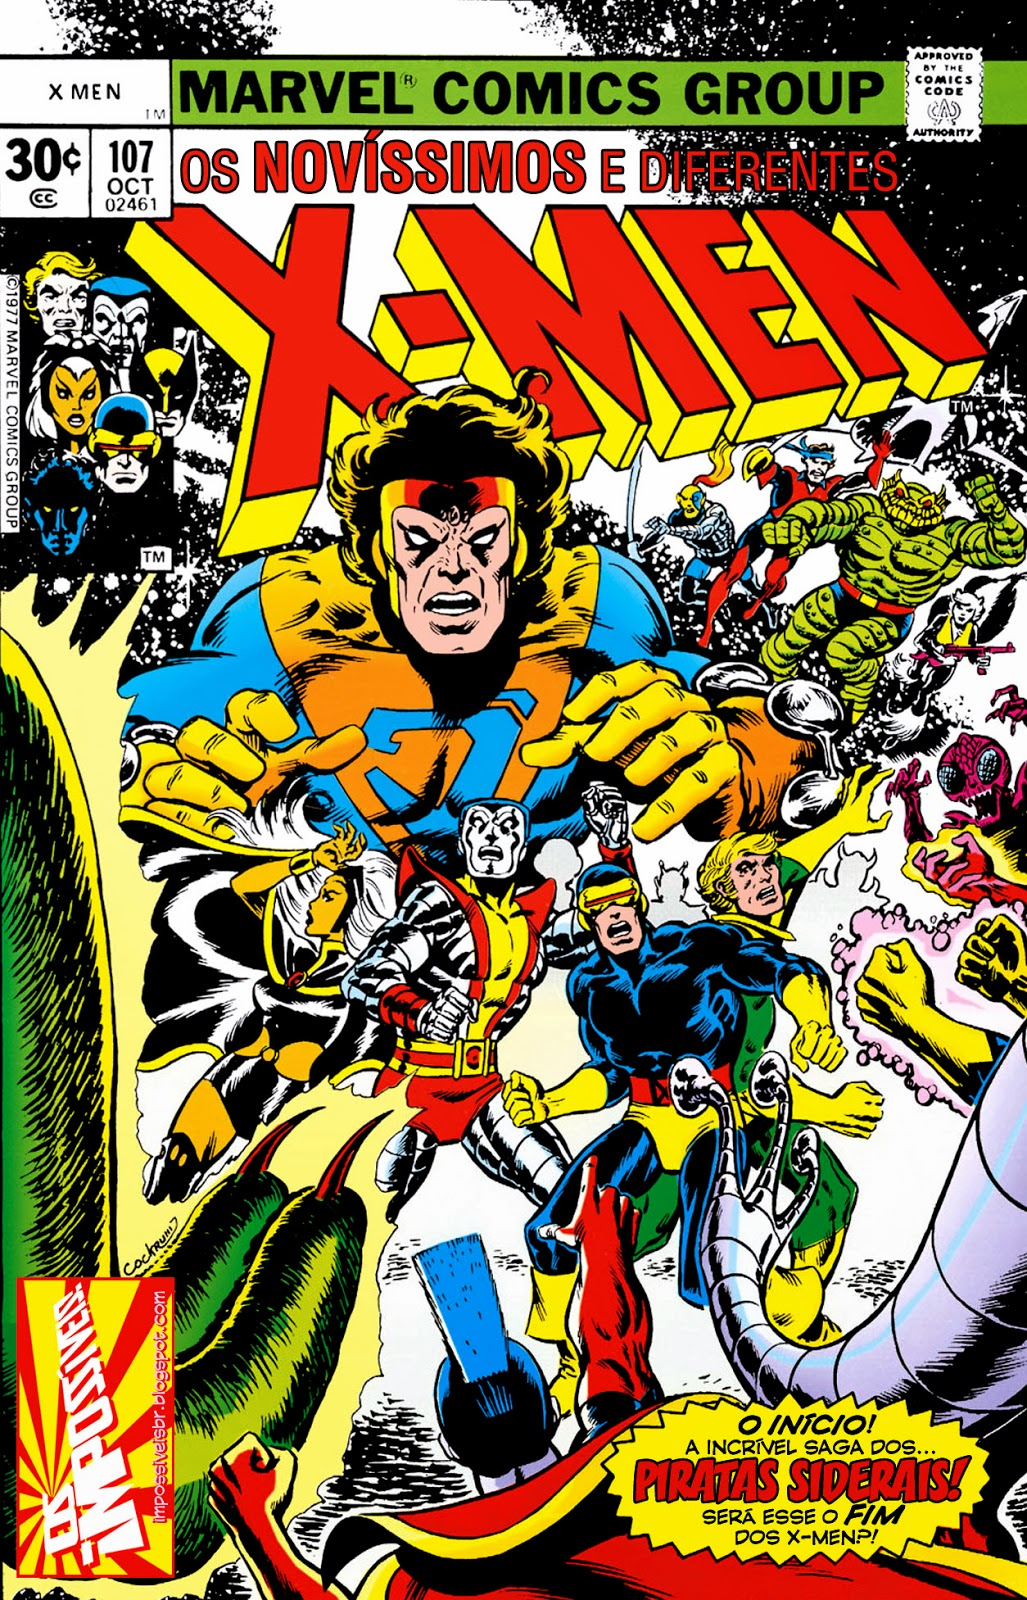 http://www.mediafire.com/download/mkzphz0zmy1picc/Os.Fabulosos.X-Men.(X-Men.V1).107.HQBR.22OUT13.Os.Impossiveis.cbr